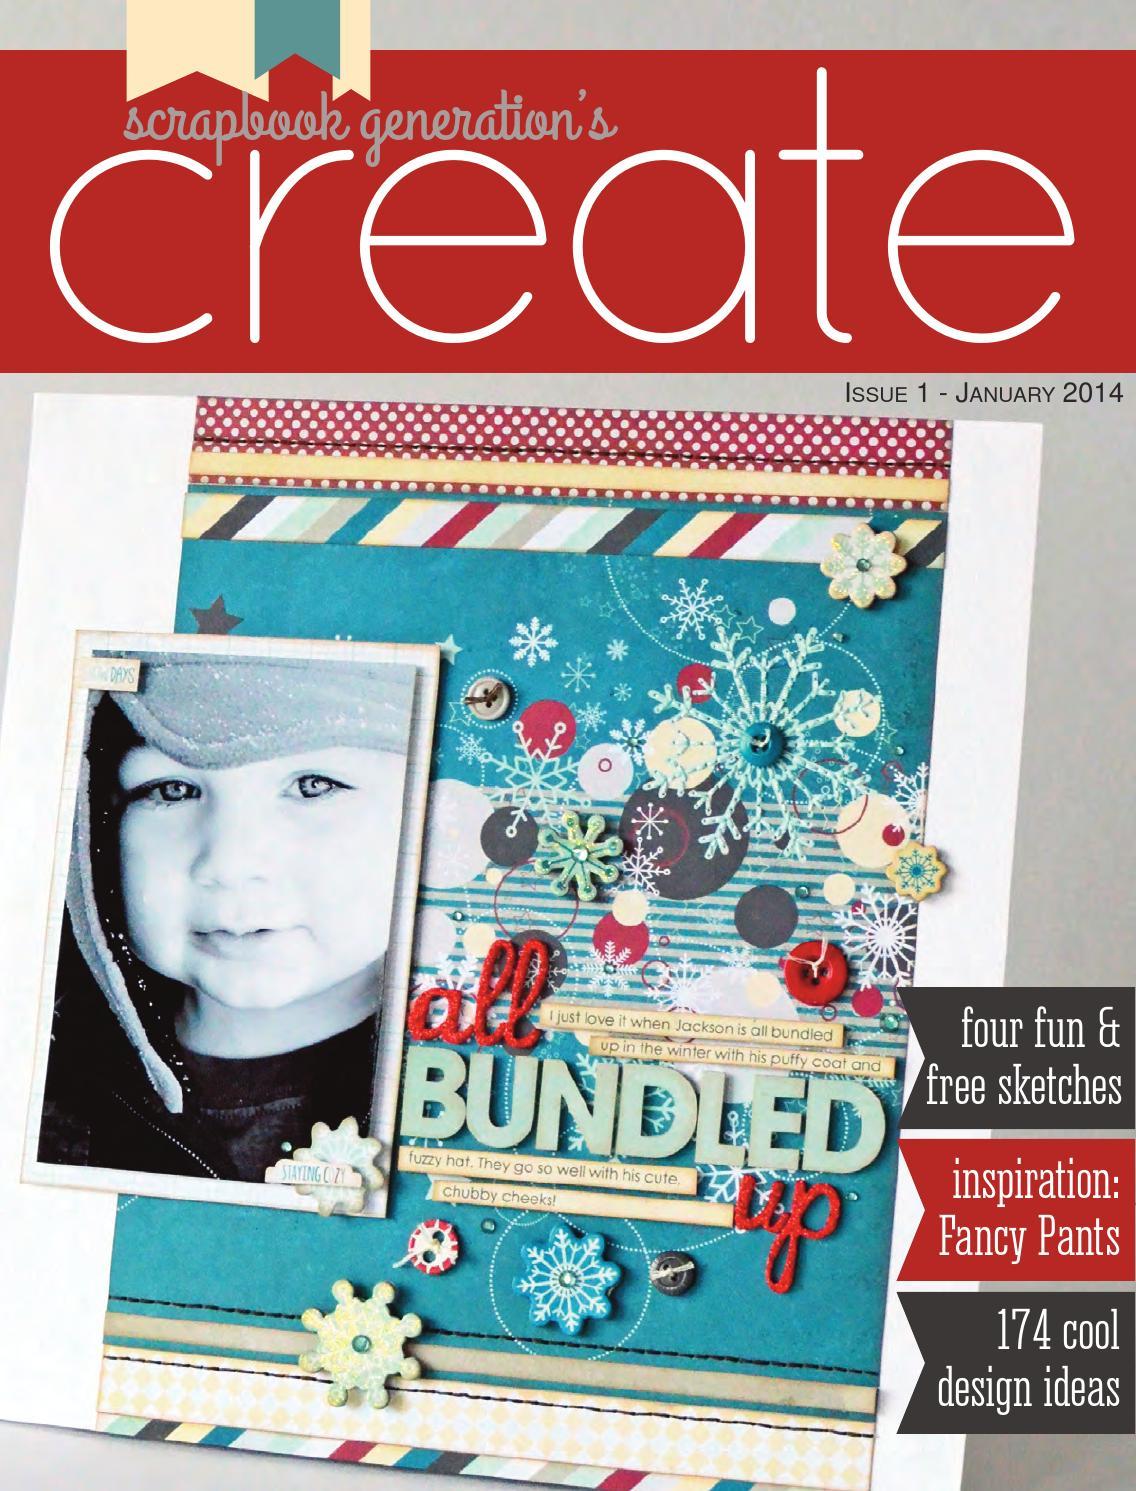 How to scrapbook magazines - How To Scrapbook Magazines 68